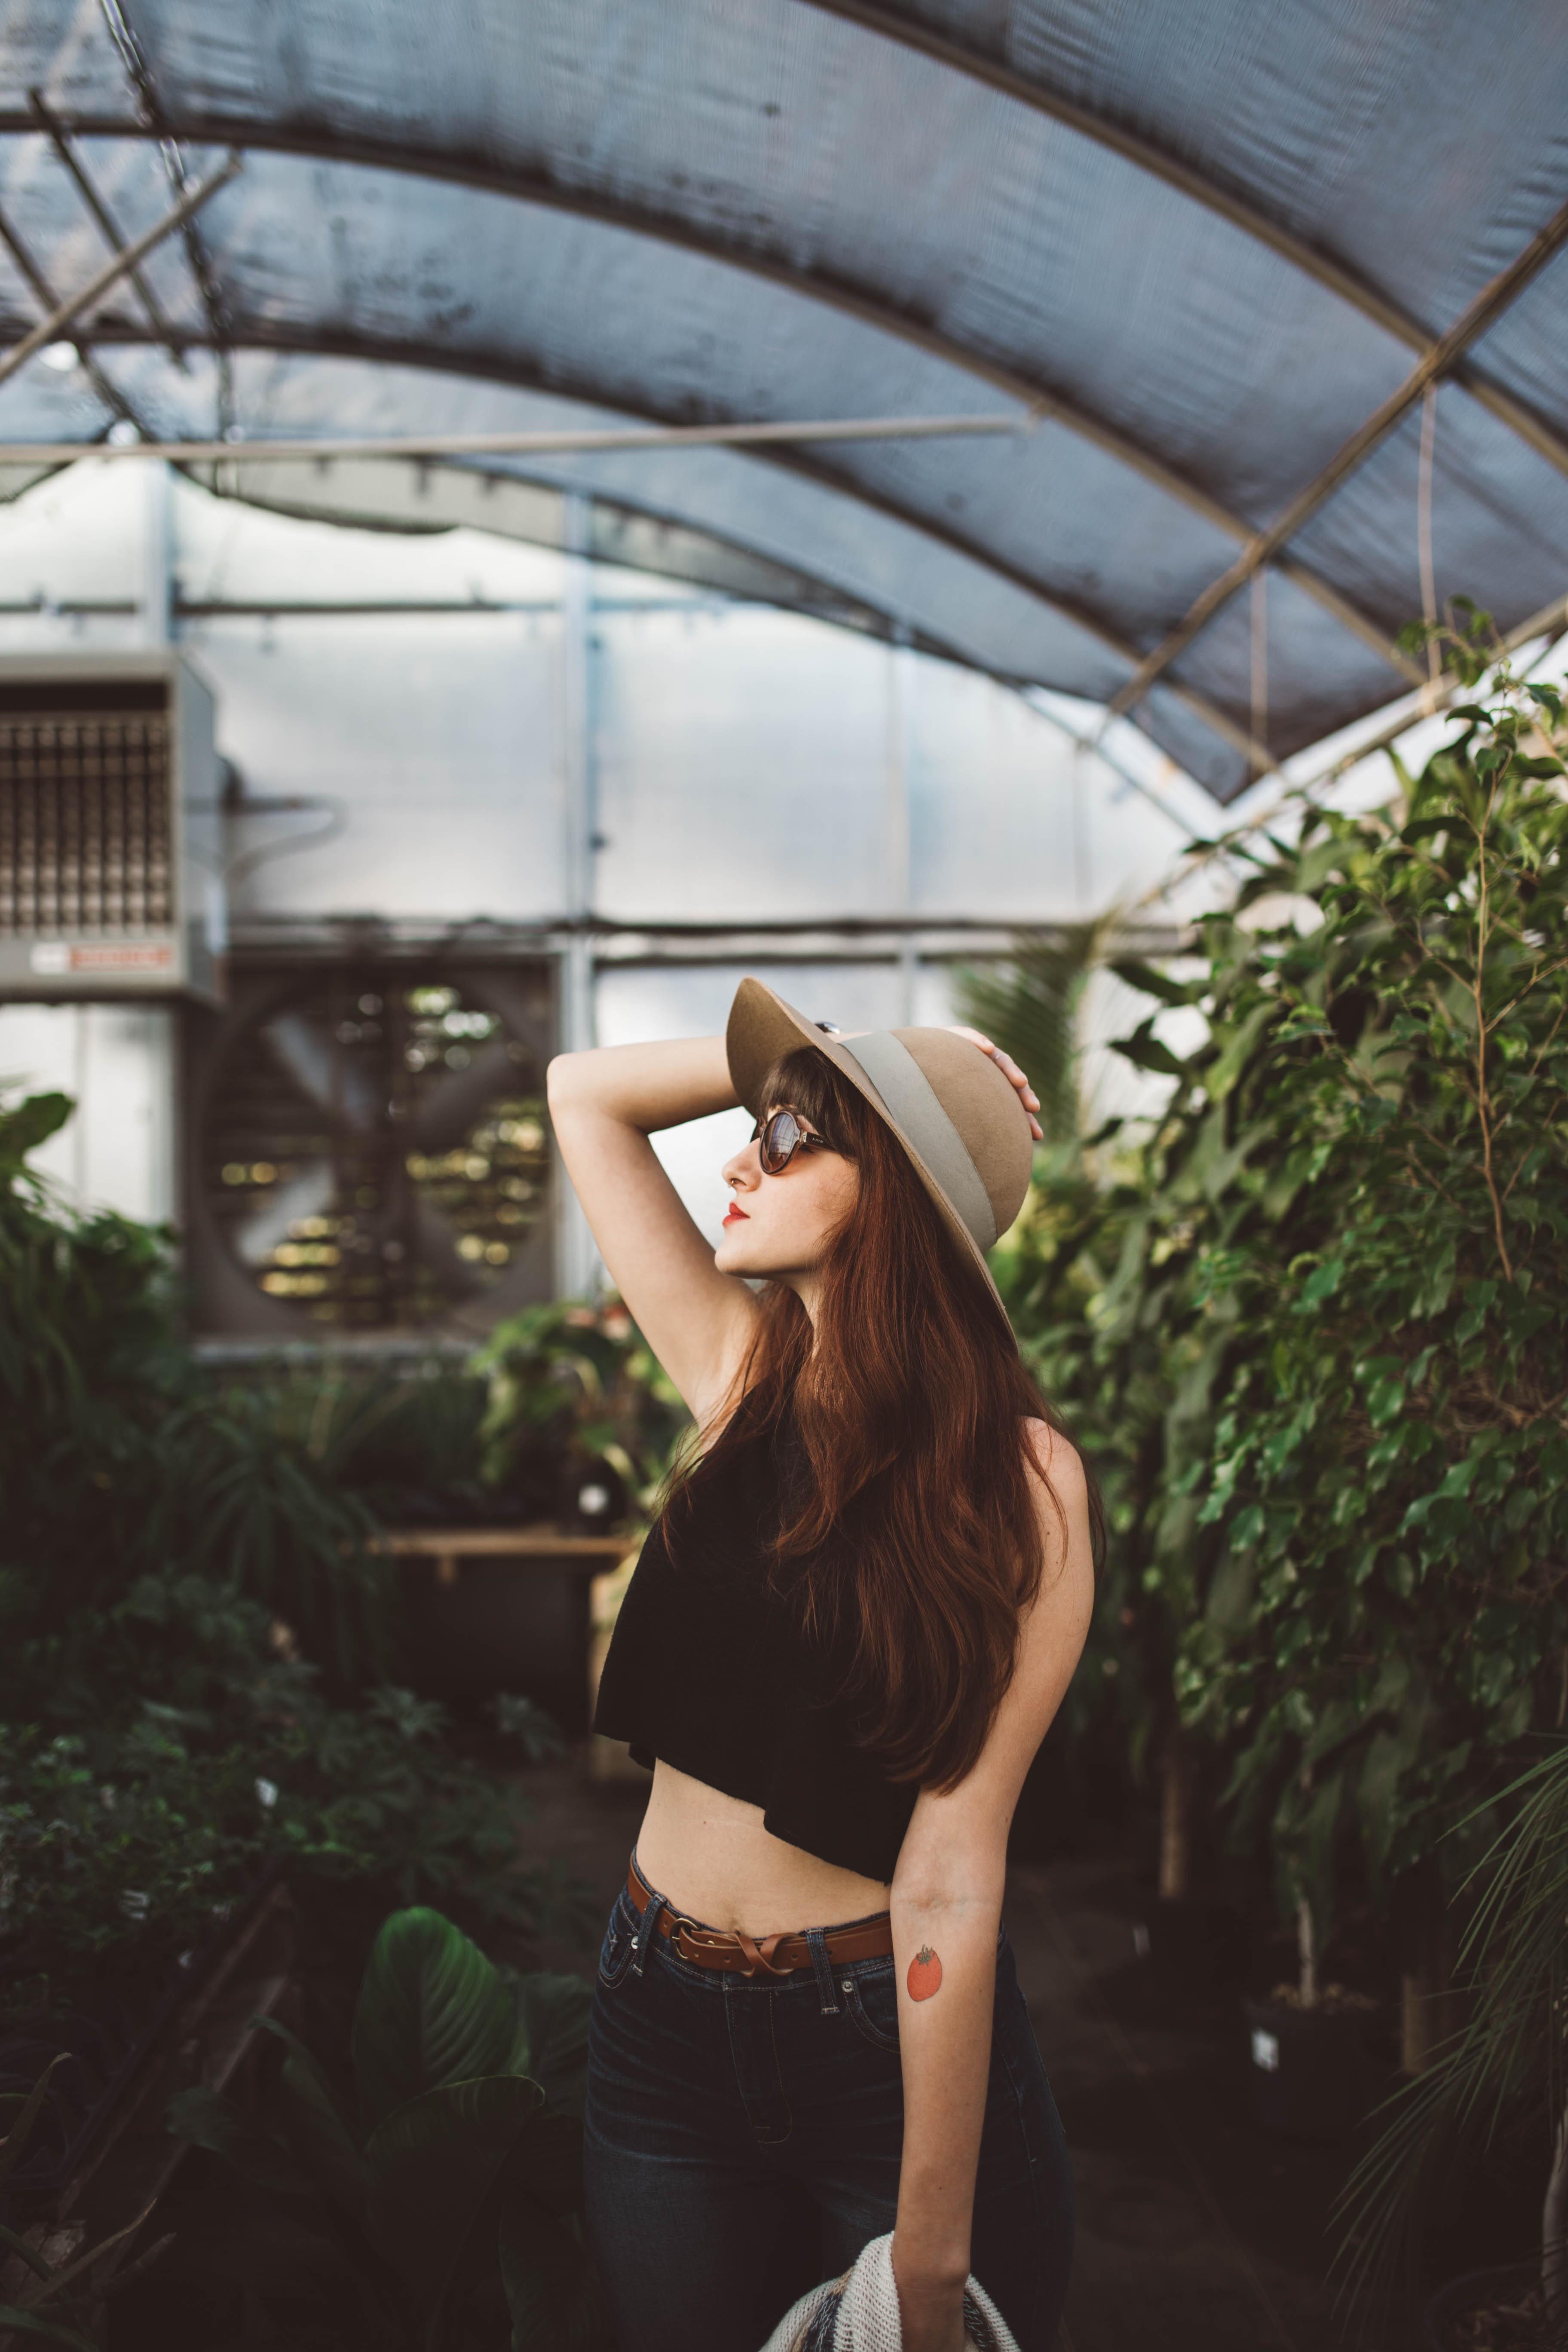 Photoshoot, Shoot, Woman, Photo, Model, HQ Photo